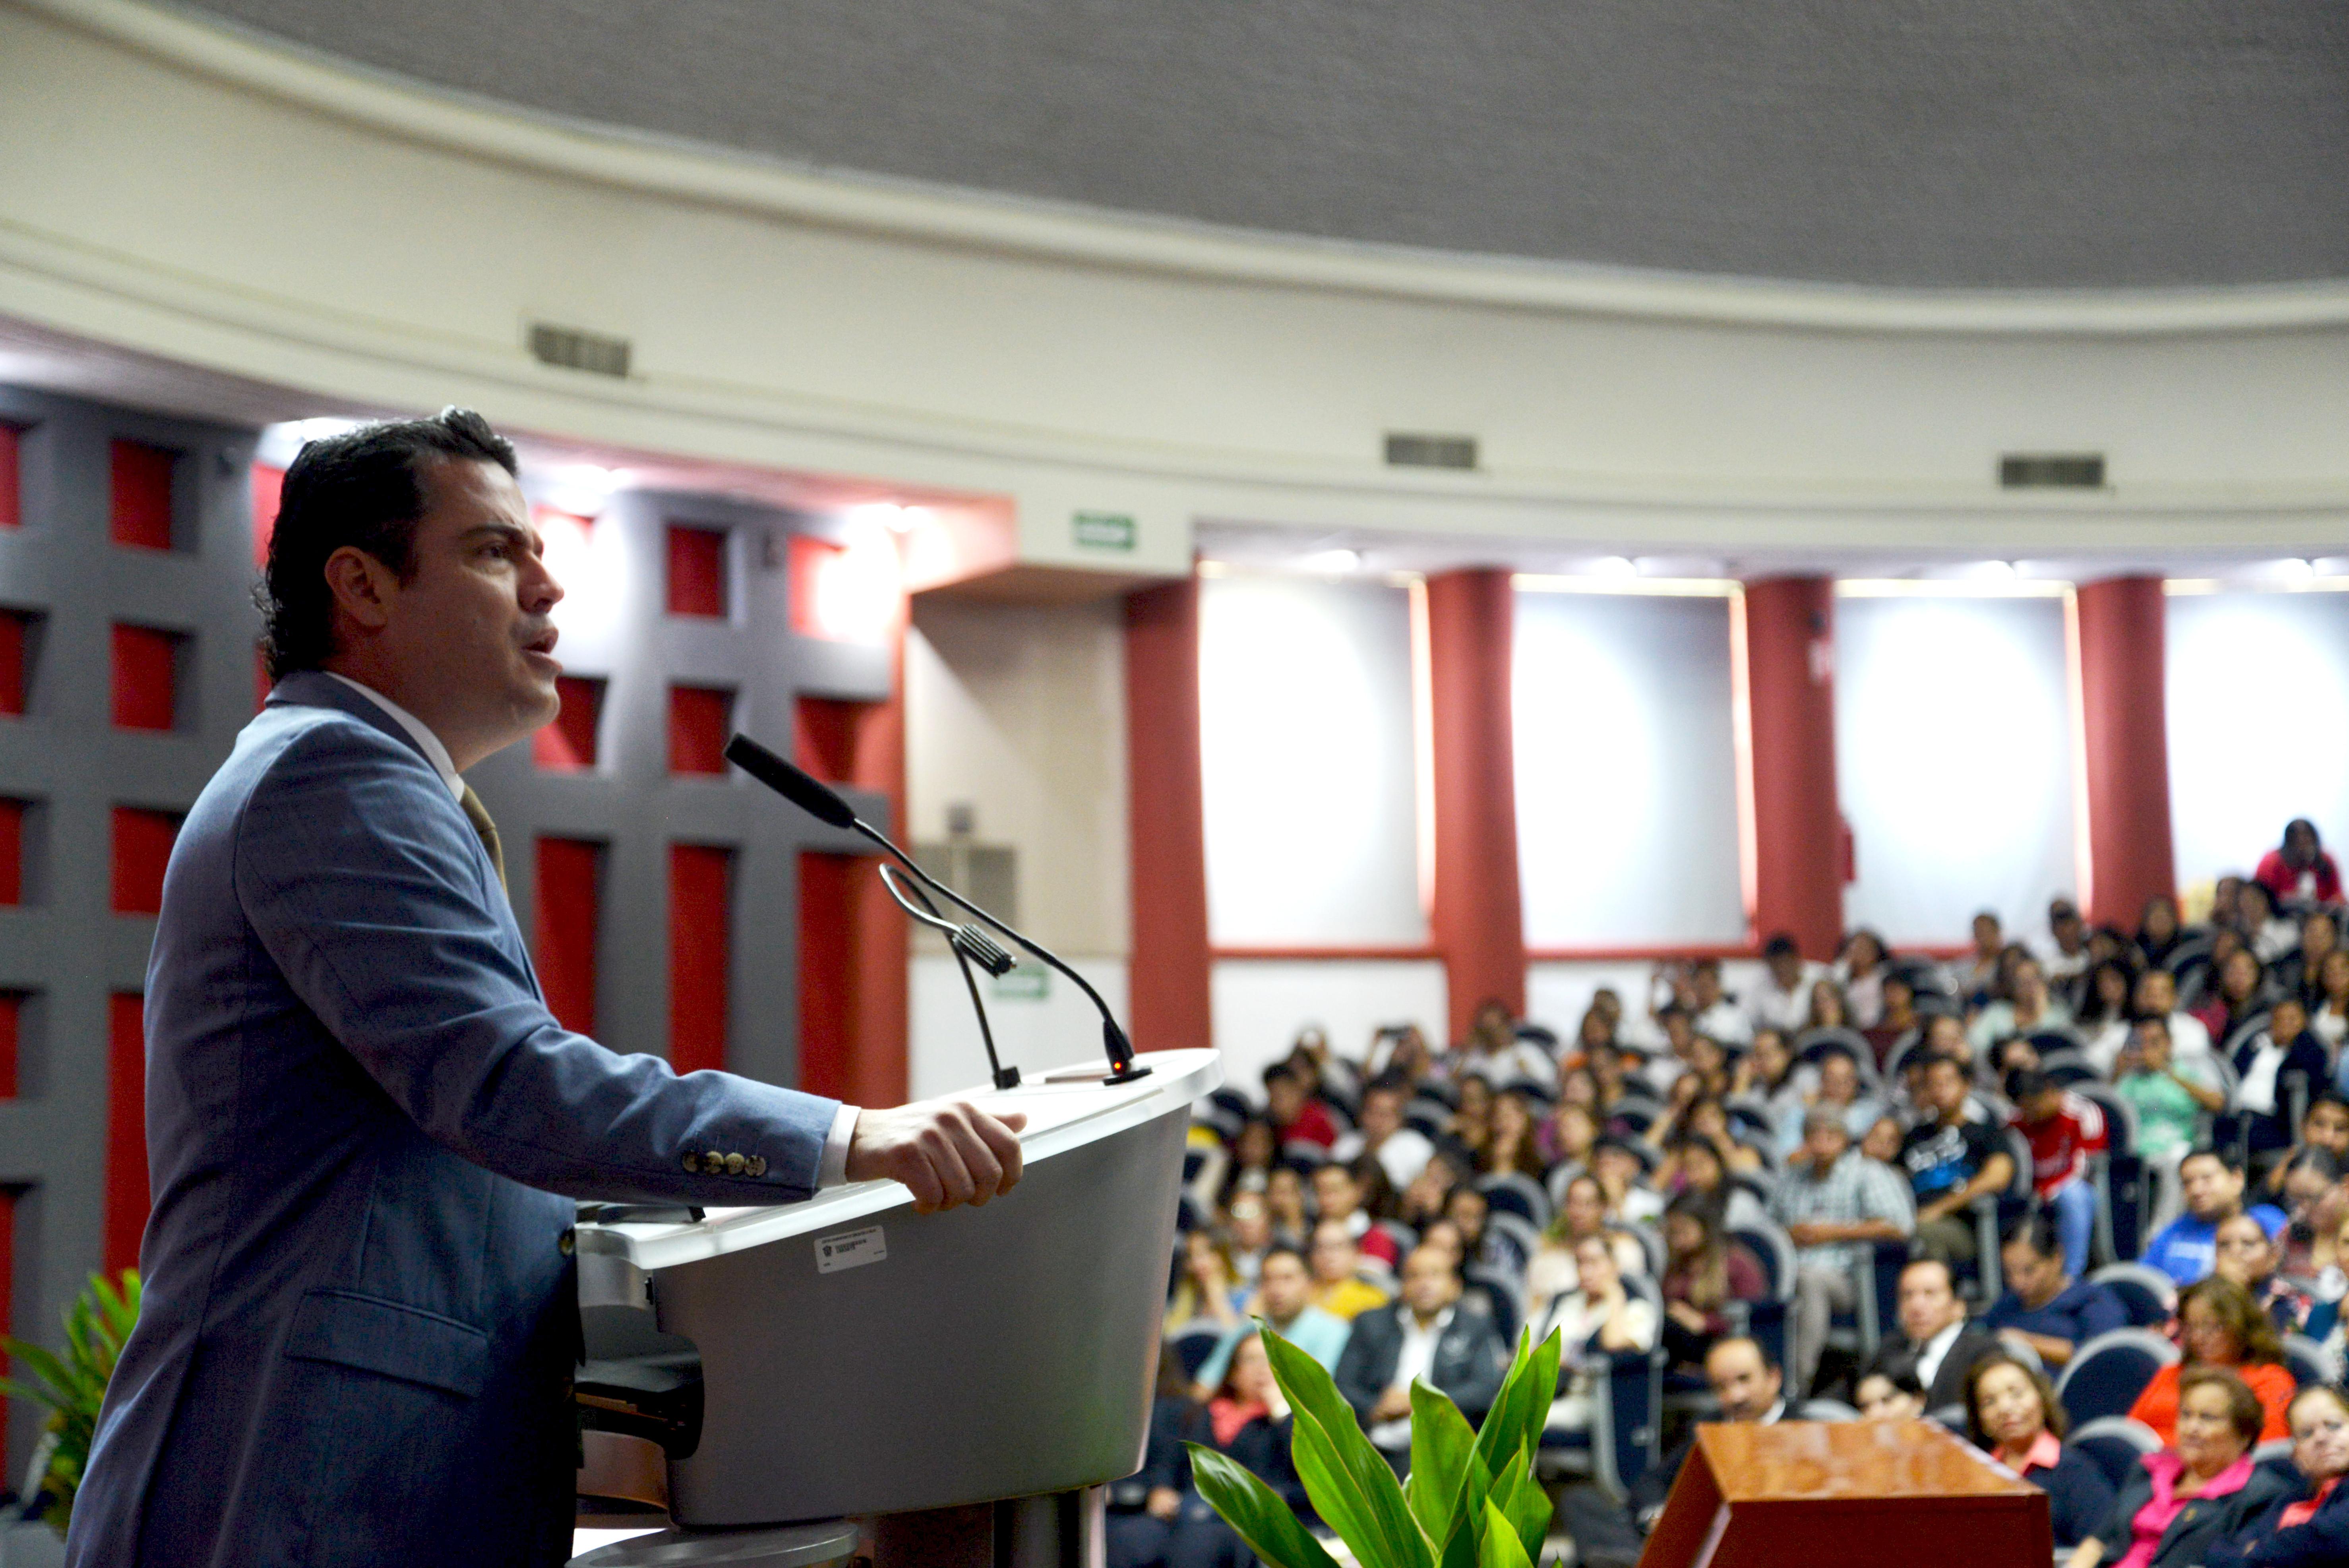 Gobernador de Jalisco inaugurando foro